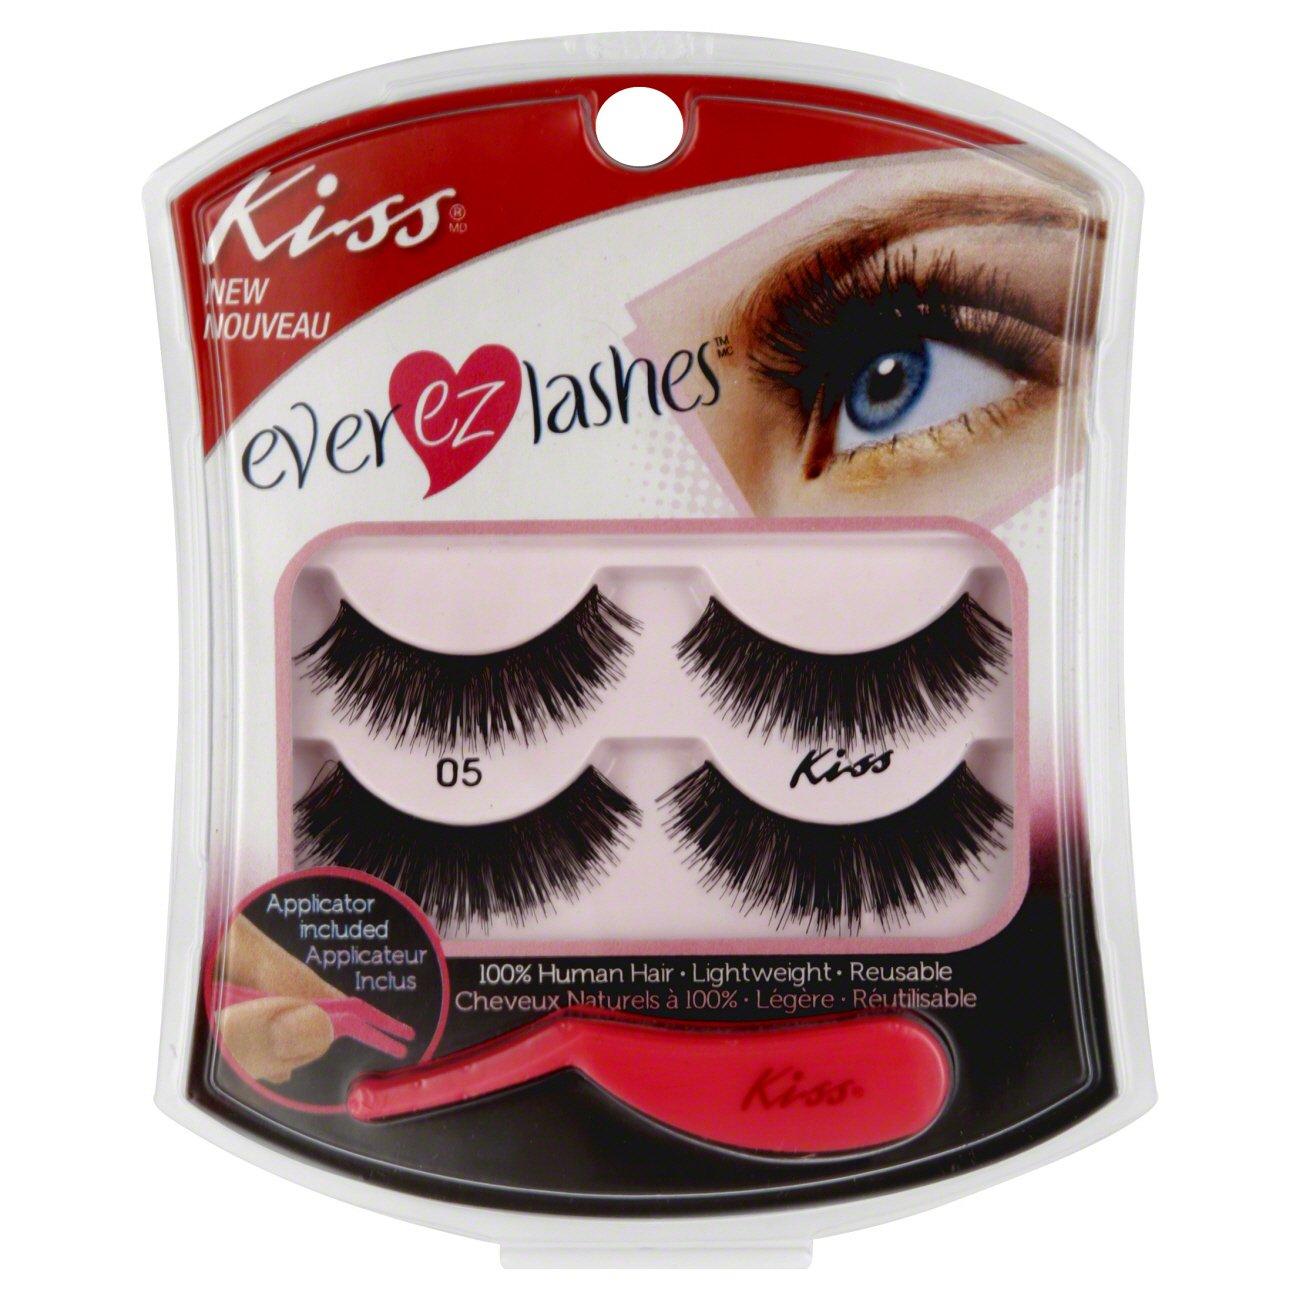 Kiss Ever Ez Lash 05